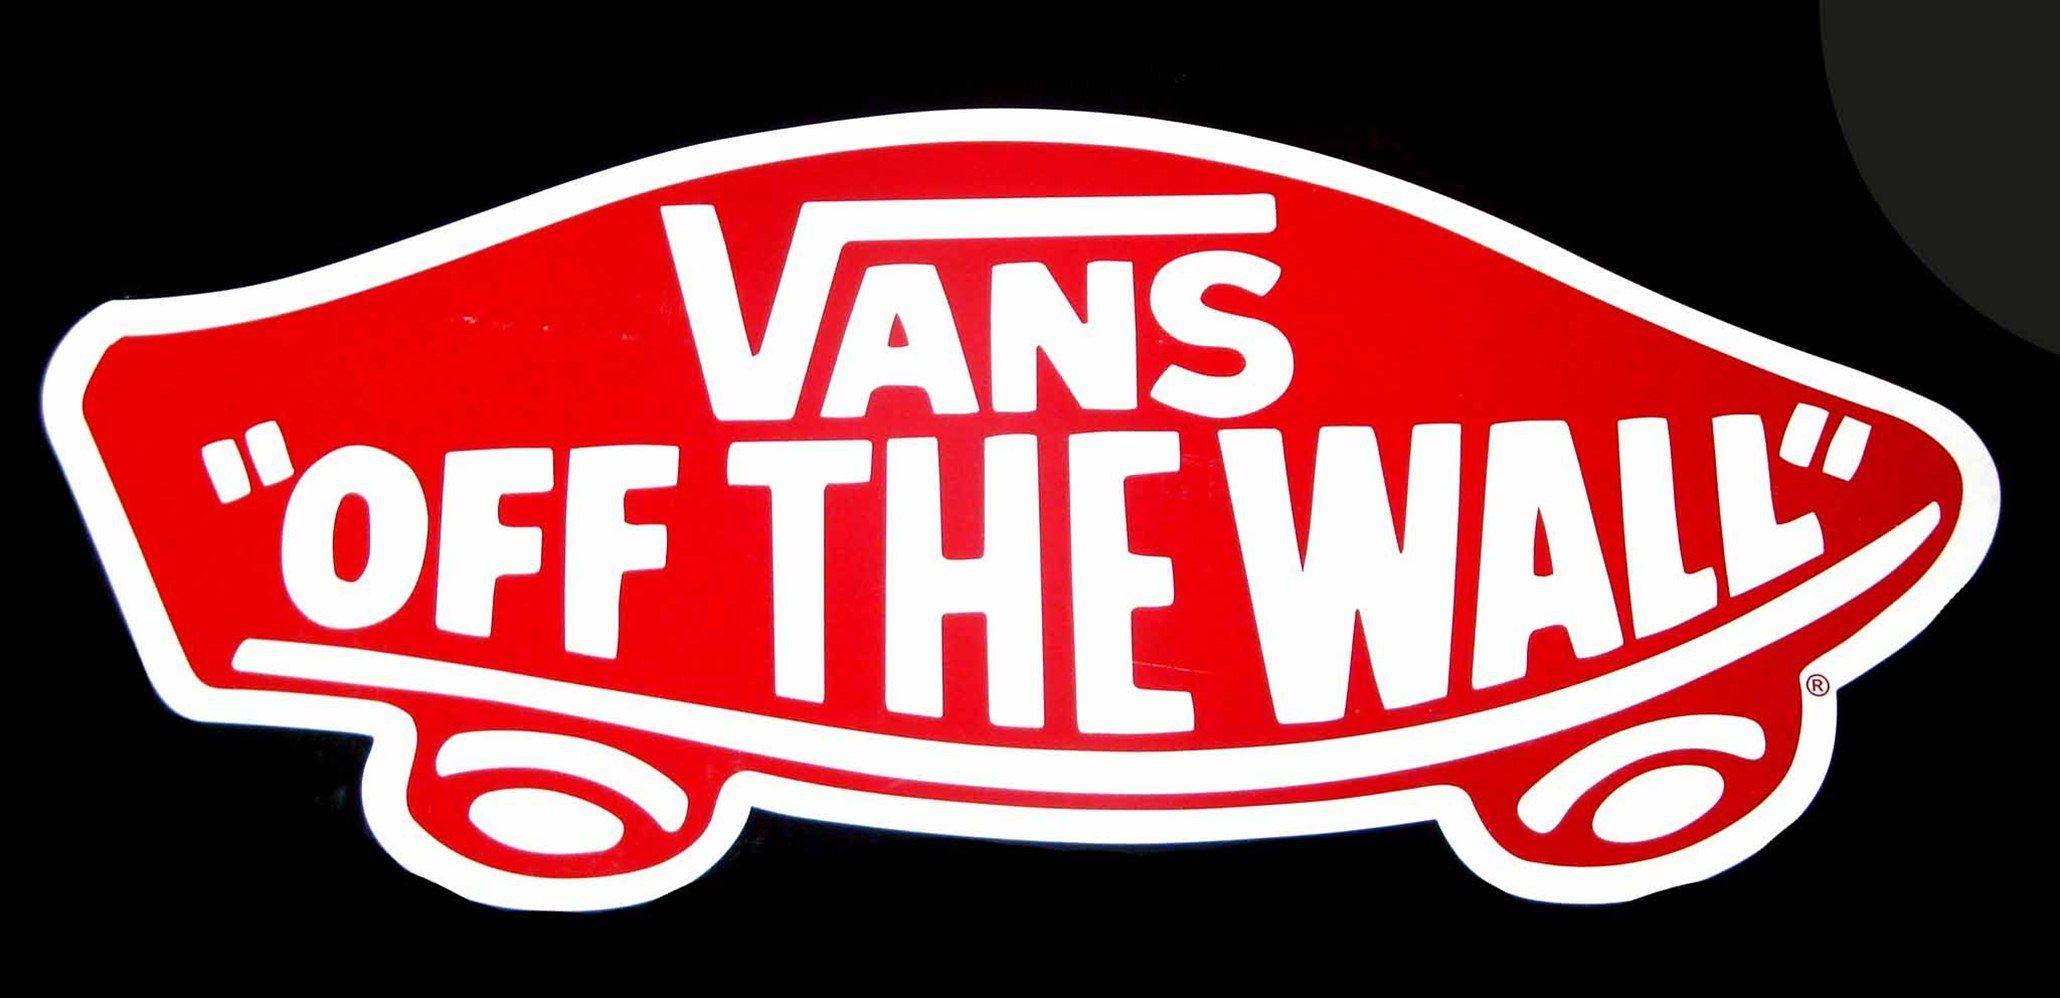 Hd Wallpapers Vans Logo Wallpaper Cave